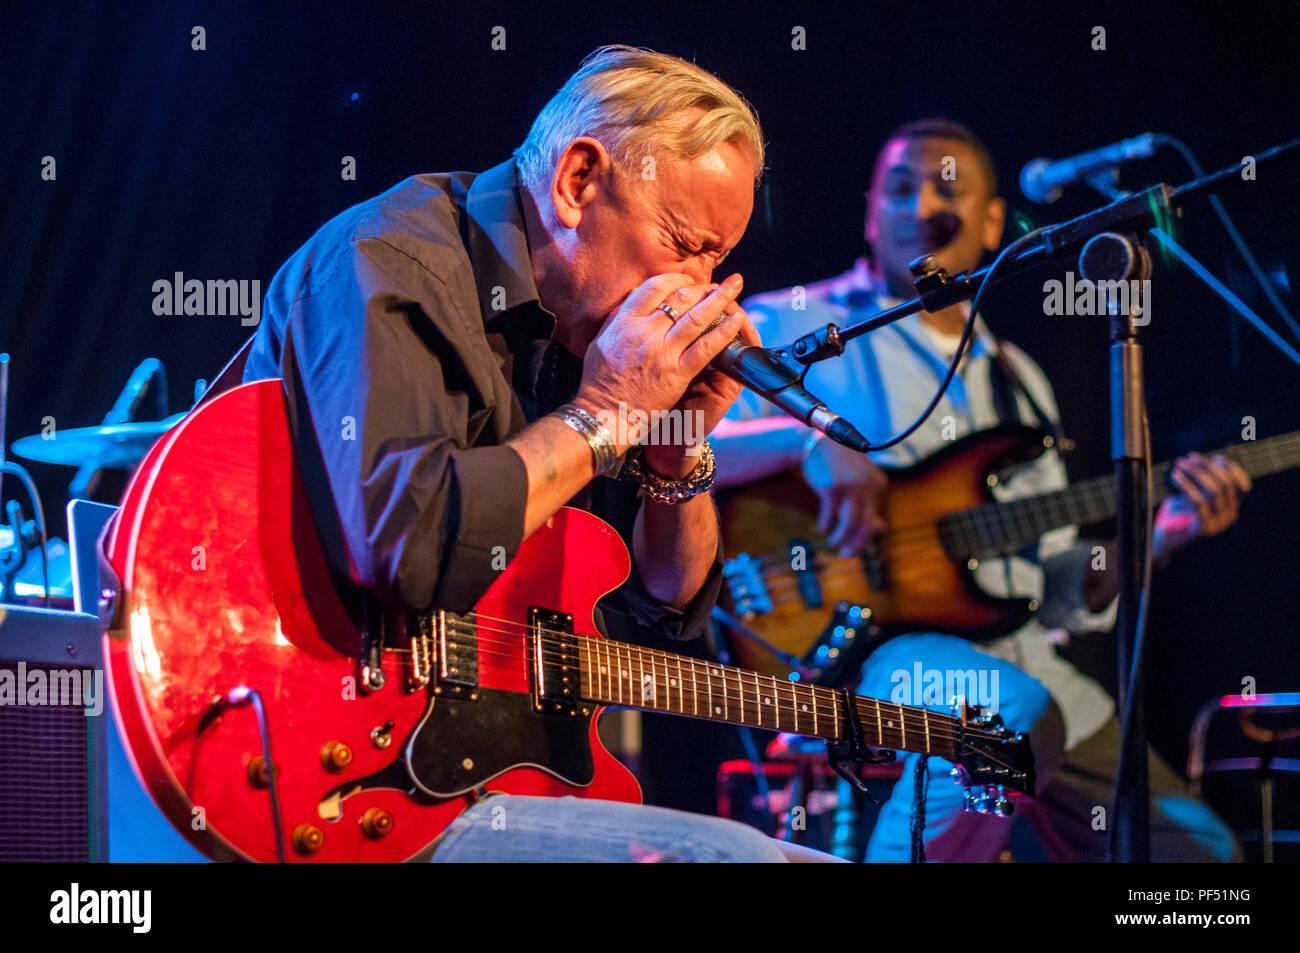 Don Baker Irish Blues Musician Performing Live in Belfast's Black Box - Stock Image